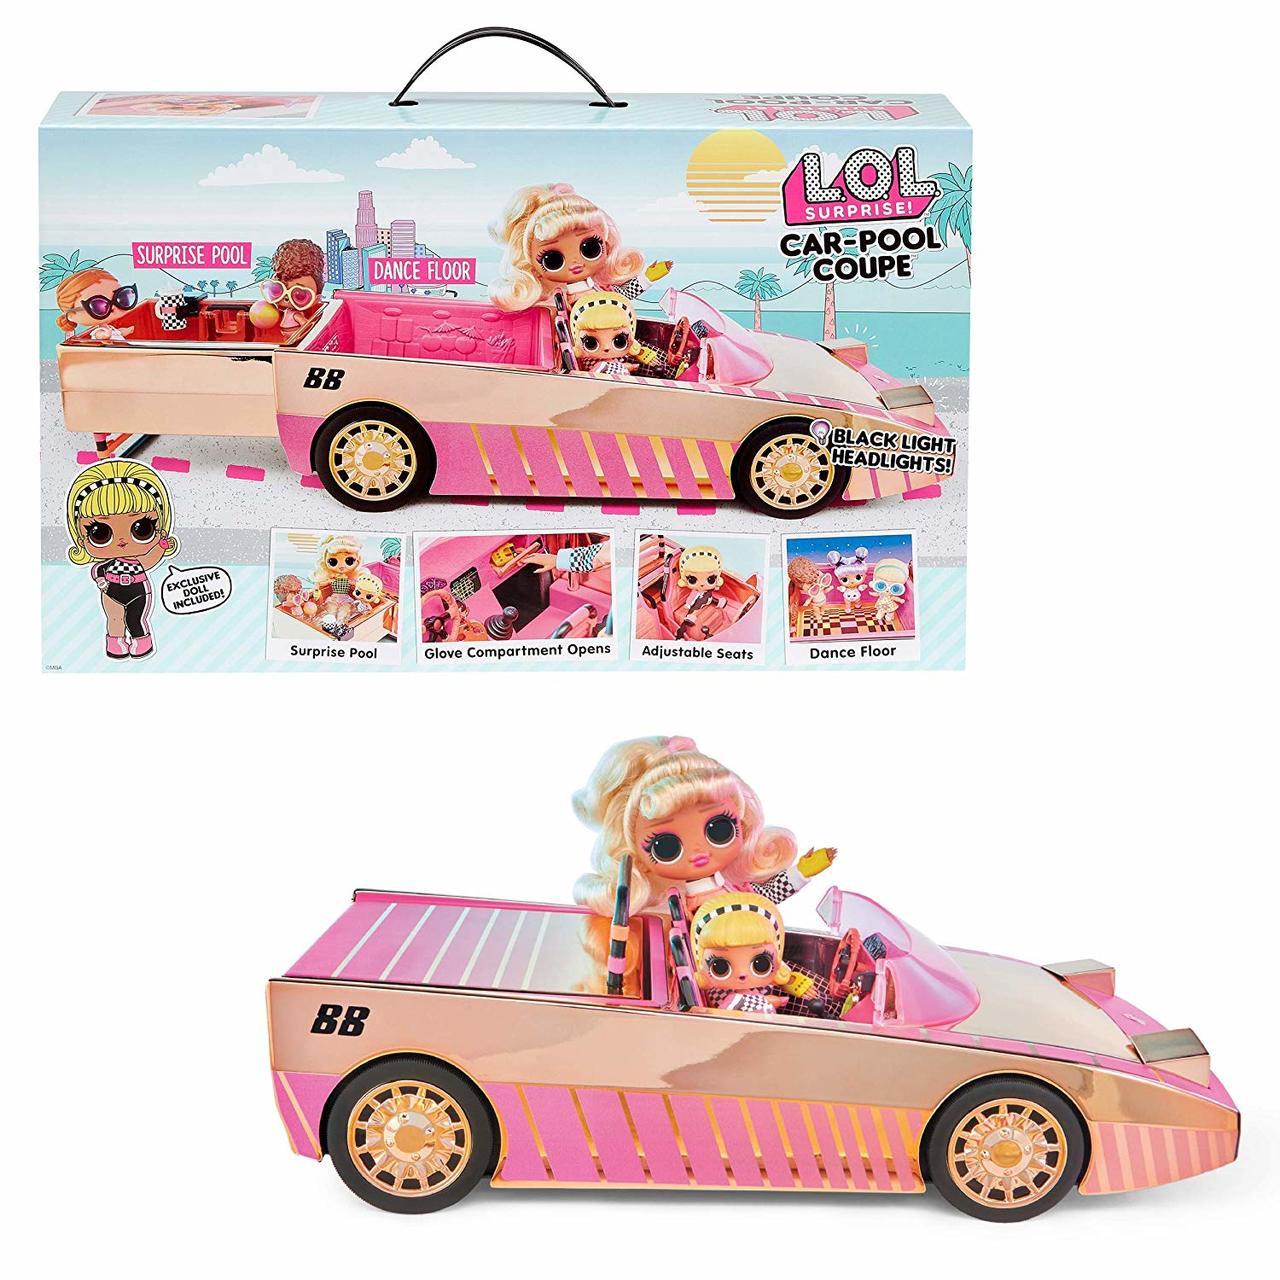 L.O.L SUPRISE CAR-POOL COUPE